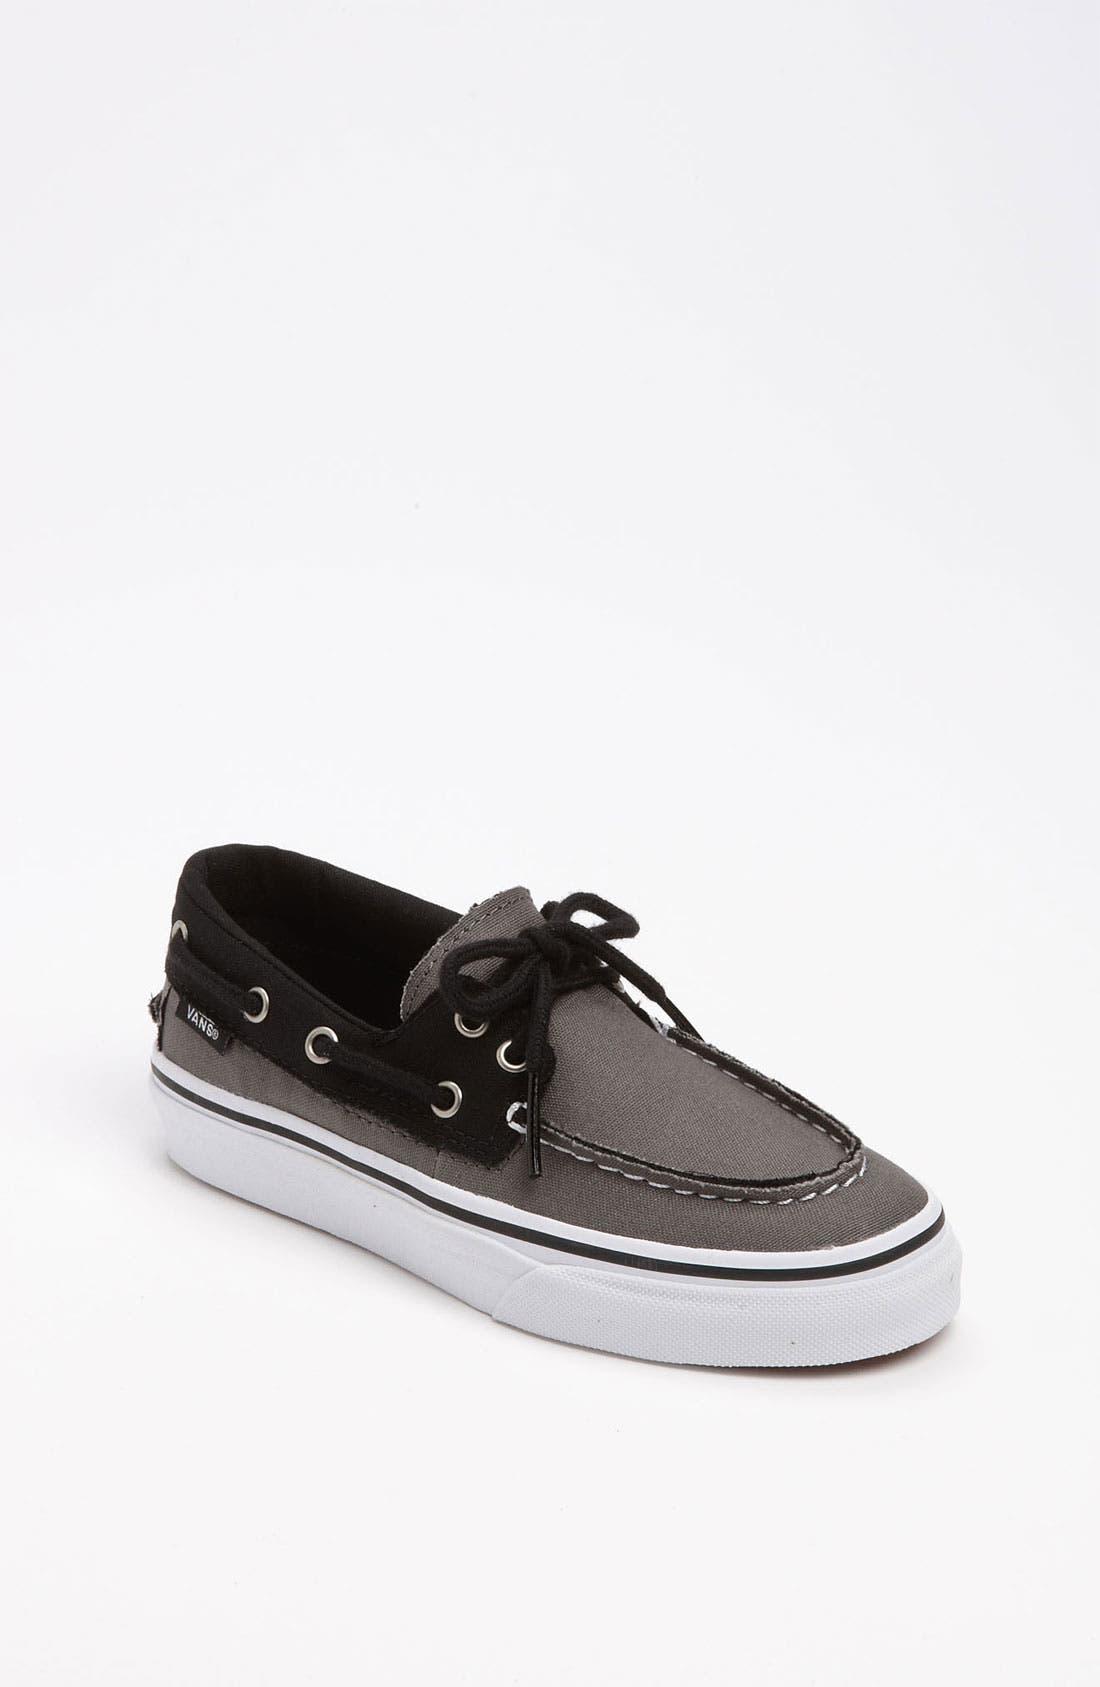 Main Image - Vans 'Zapato del Barco' Boat Shoe (Baby, Walker, Toddler, Little Kid & Big Kid)